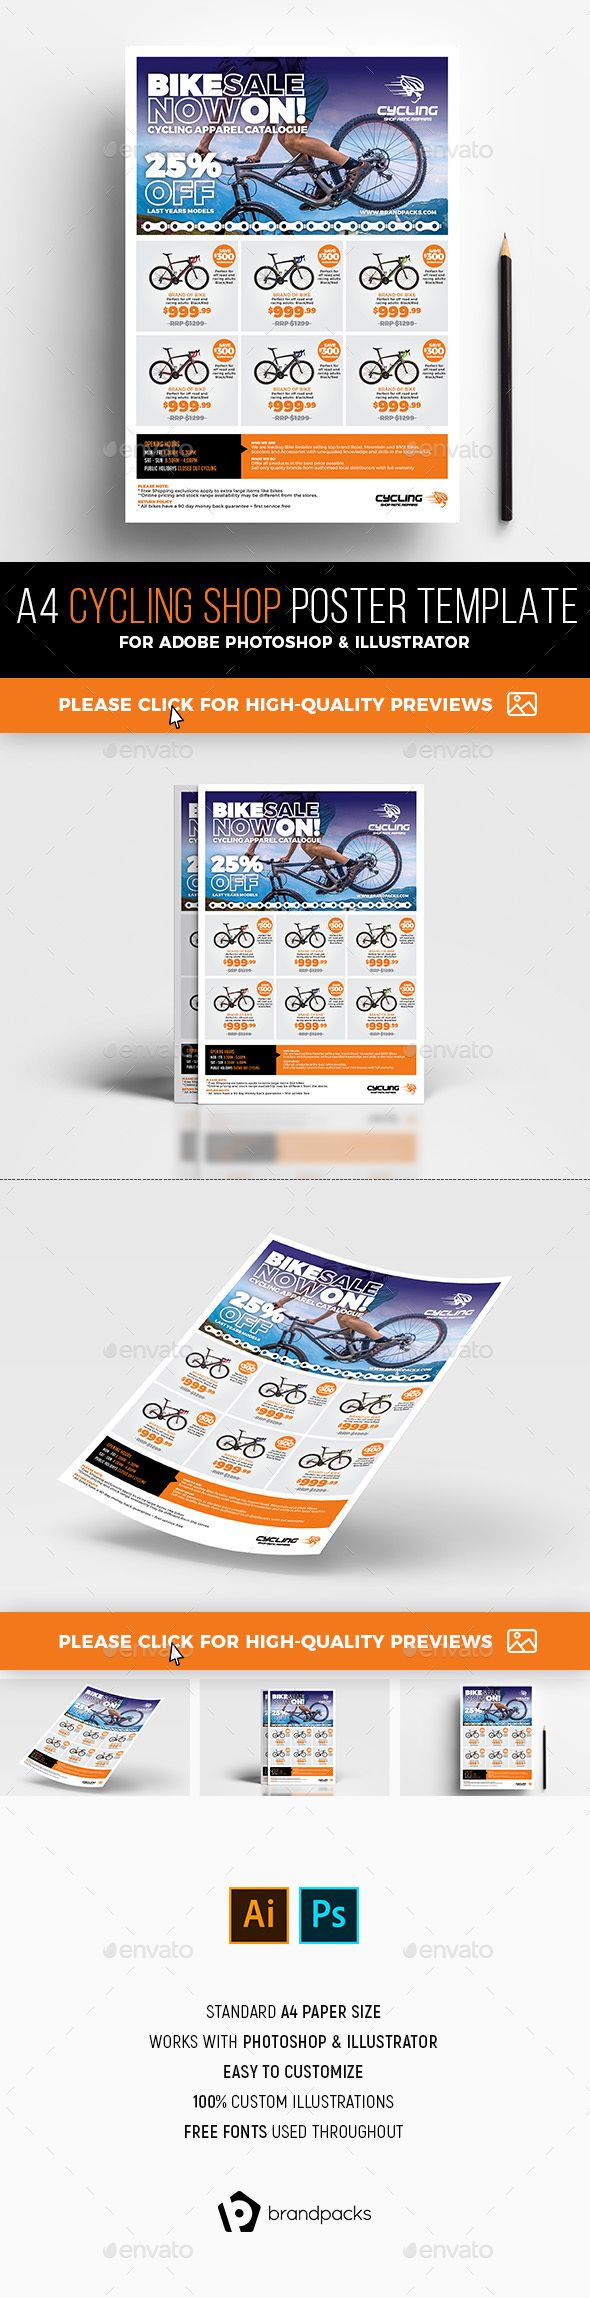 Cycling Shop Advertisement Template PSD, AI